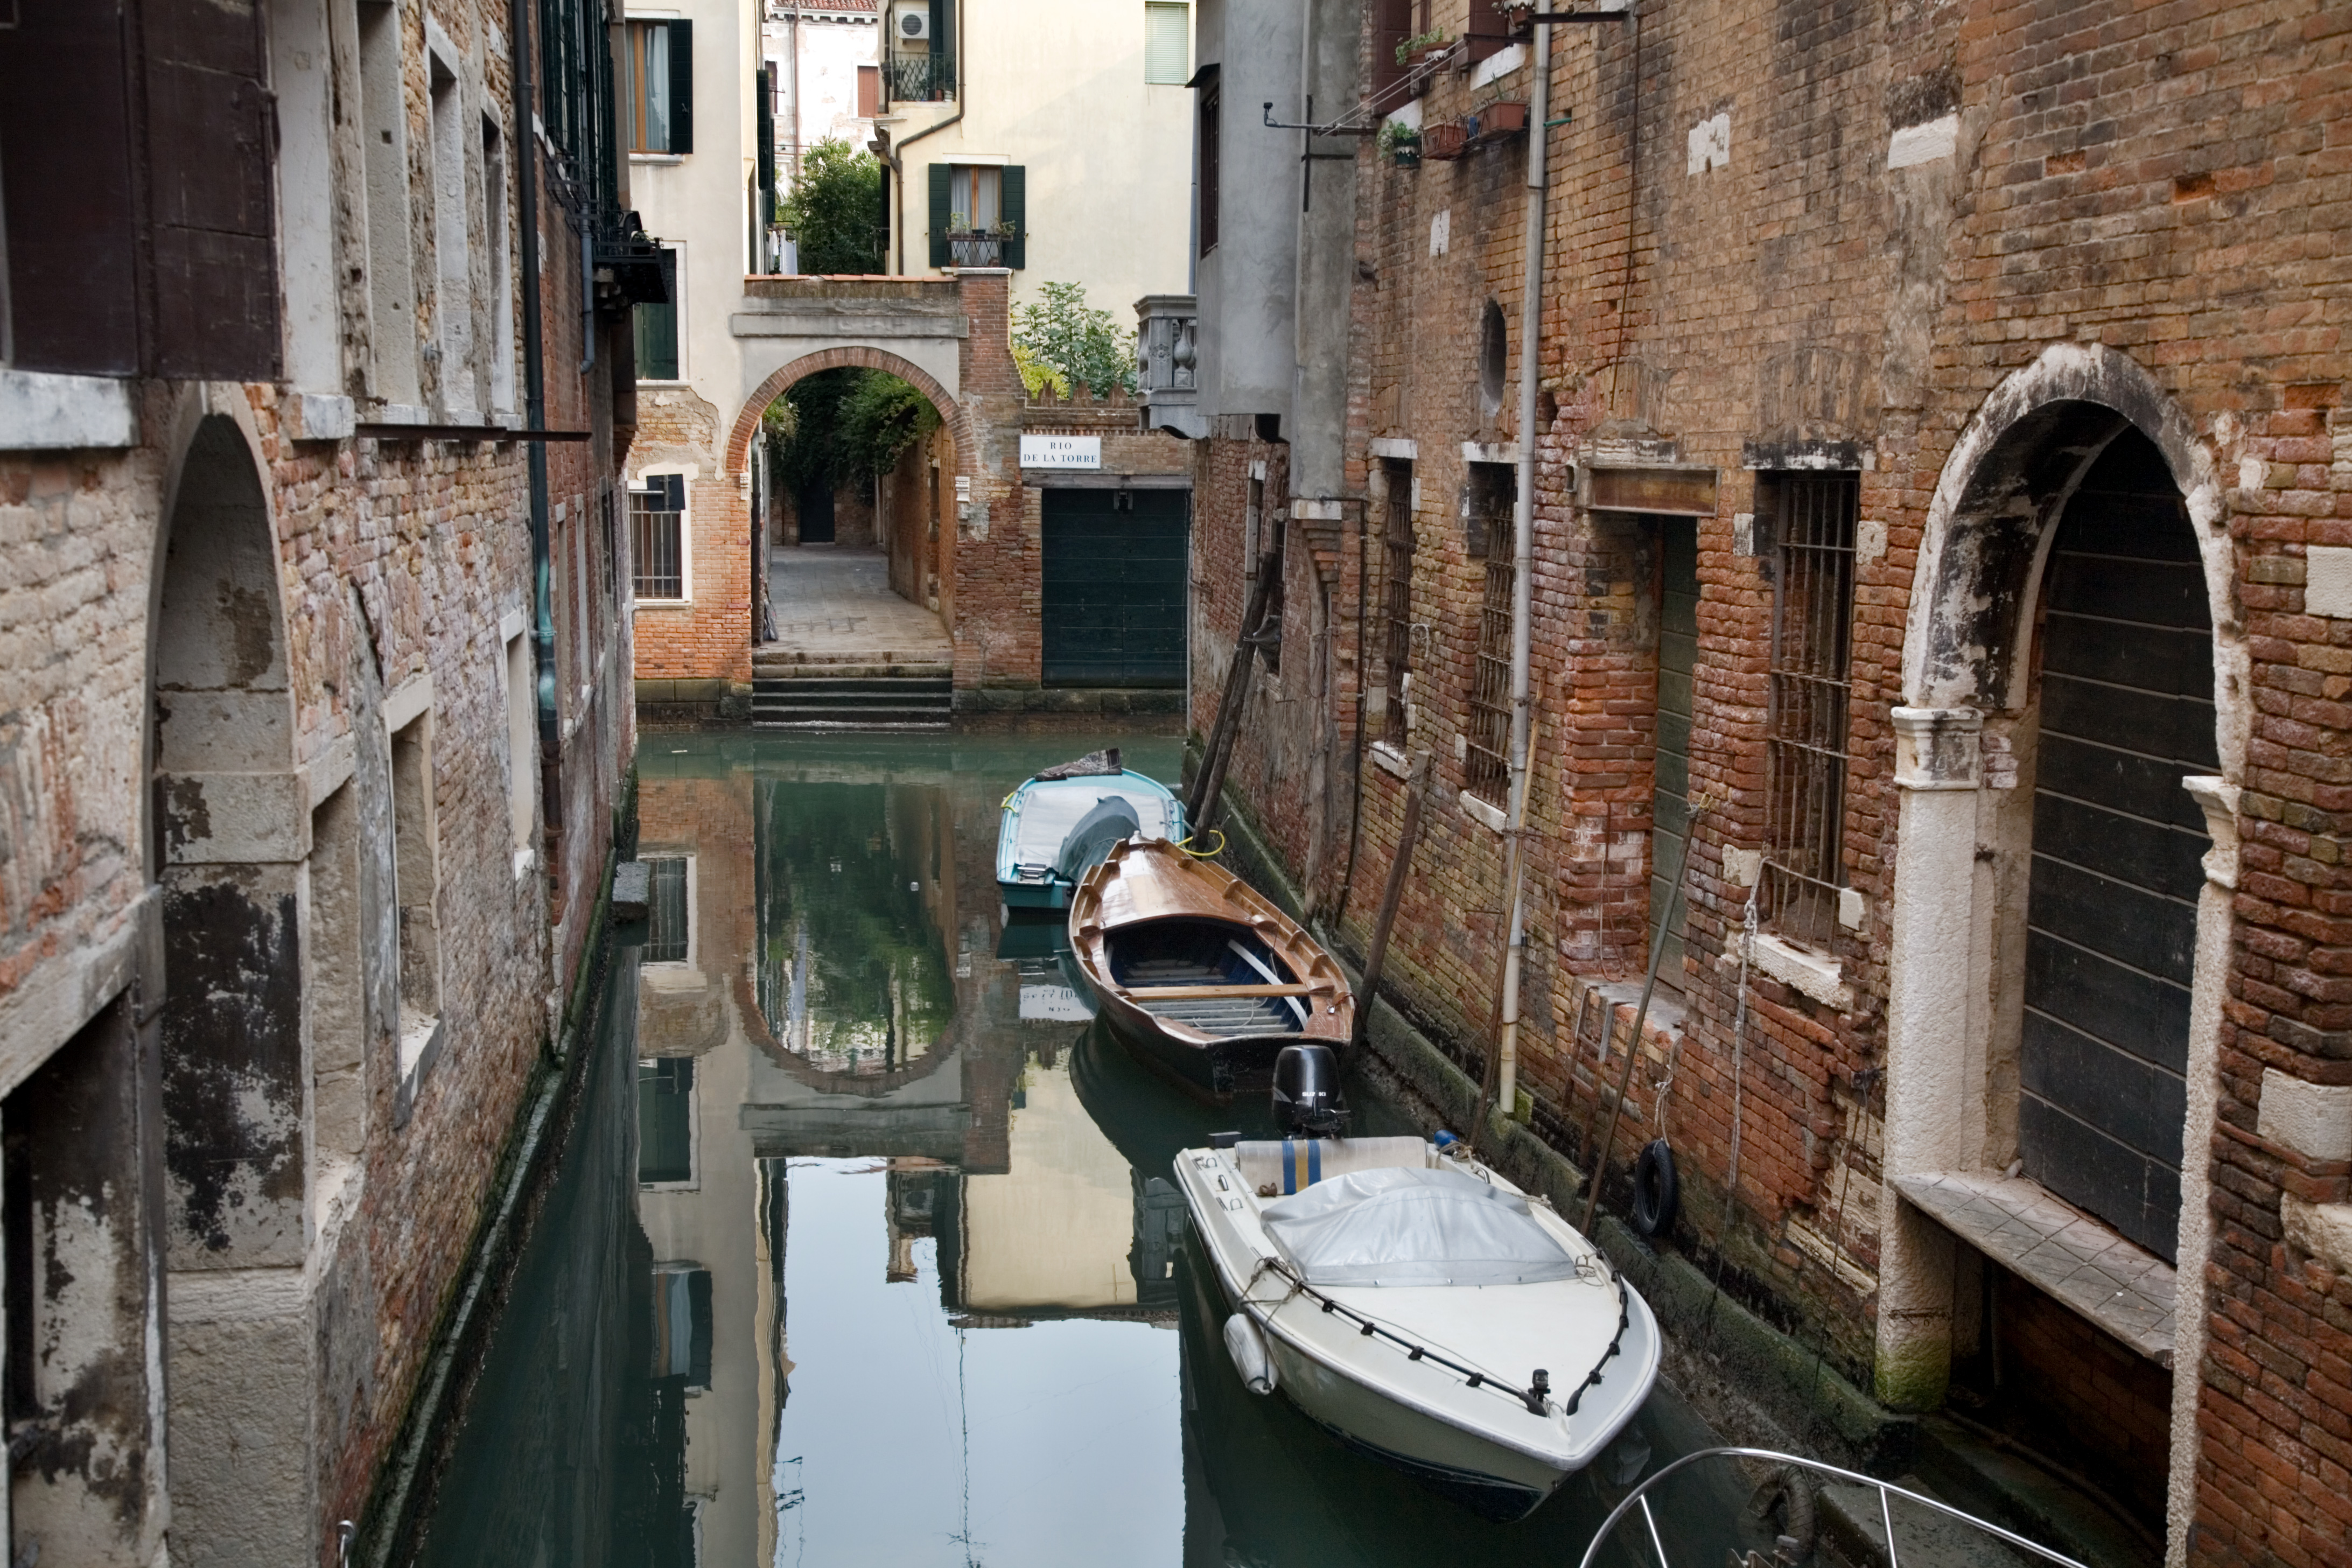 File:Venice - Street scene - 4589.jpg - Wikimedia Commons